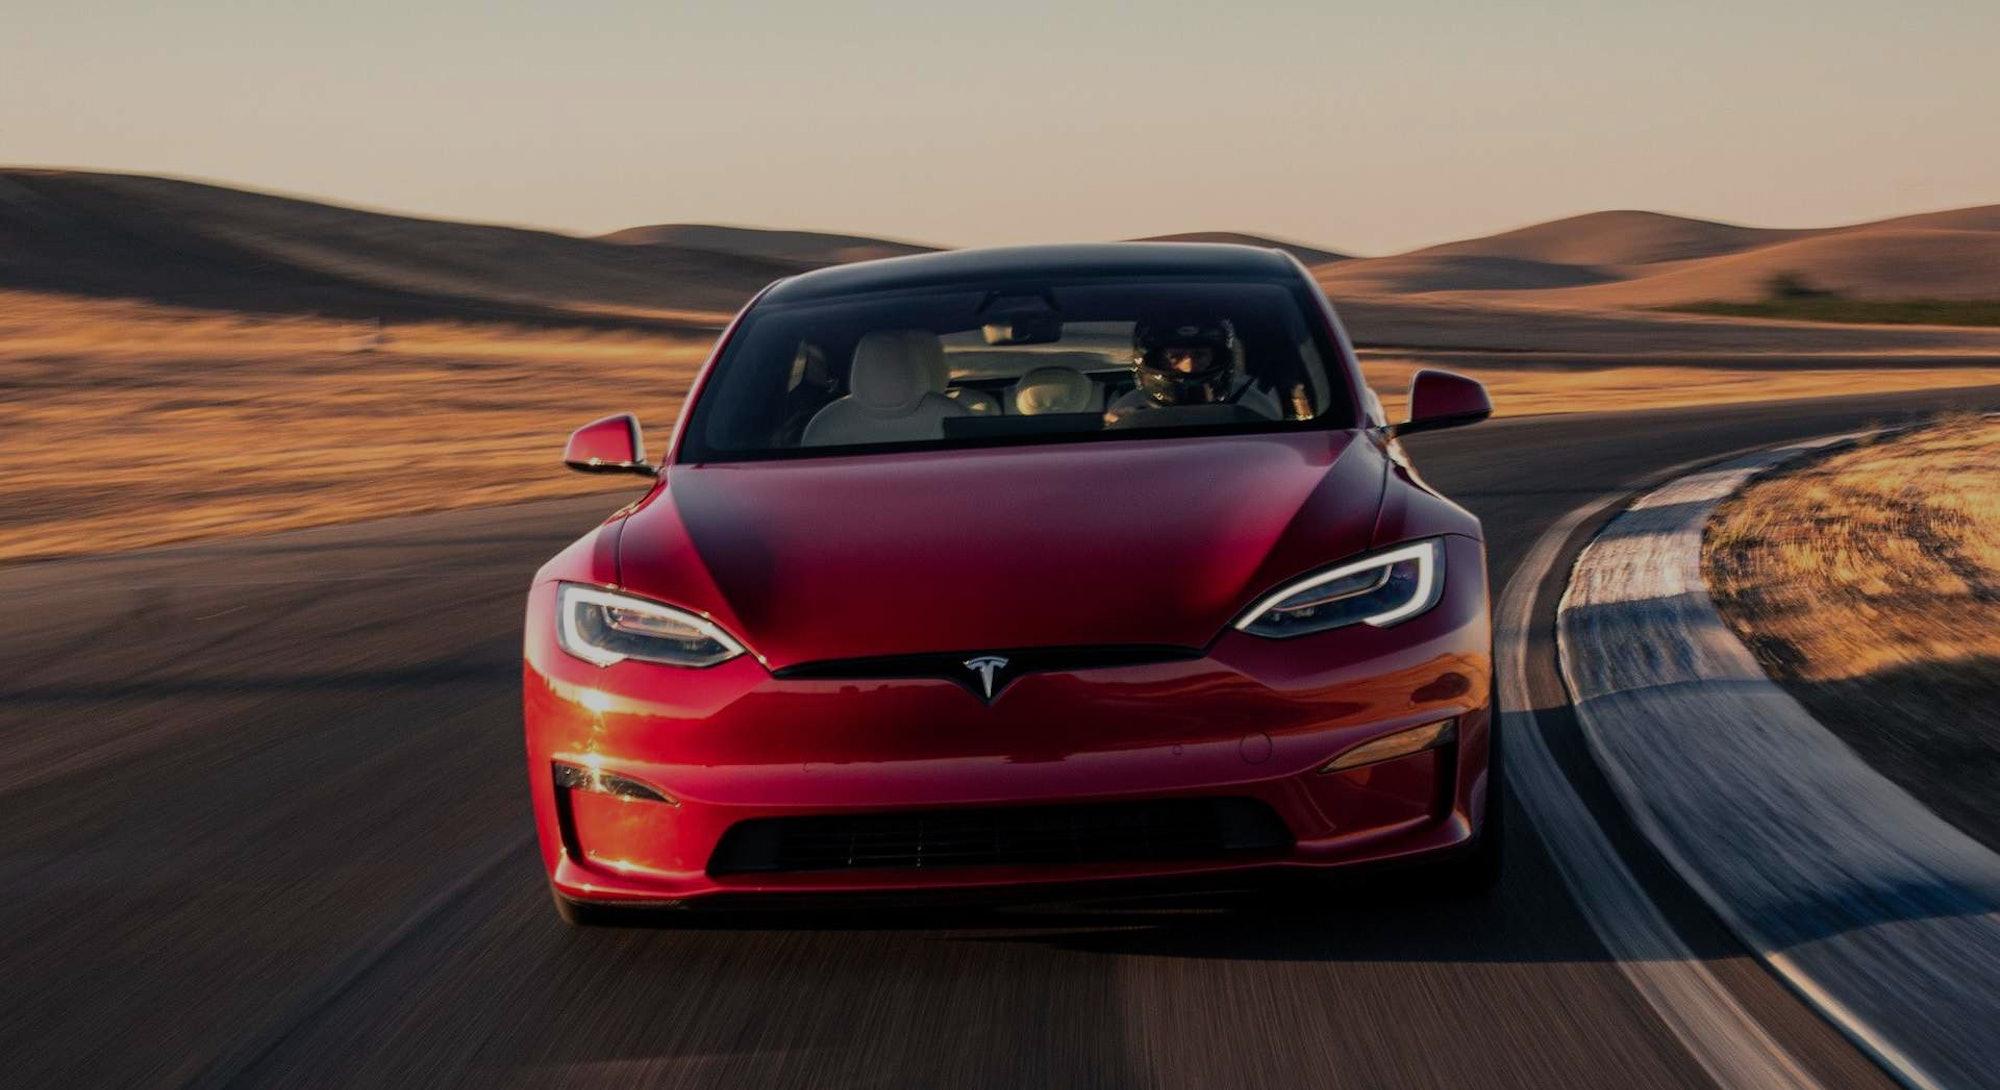 Tesla's Model S Plaid